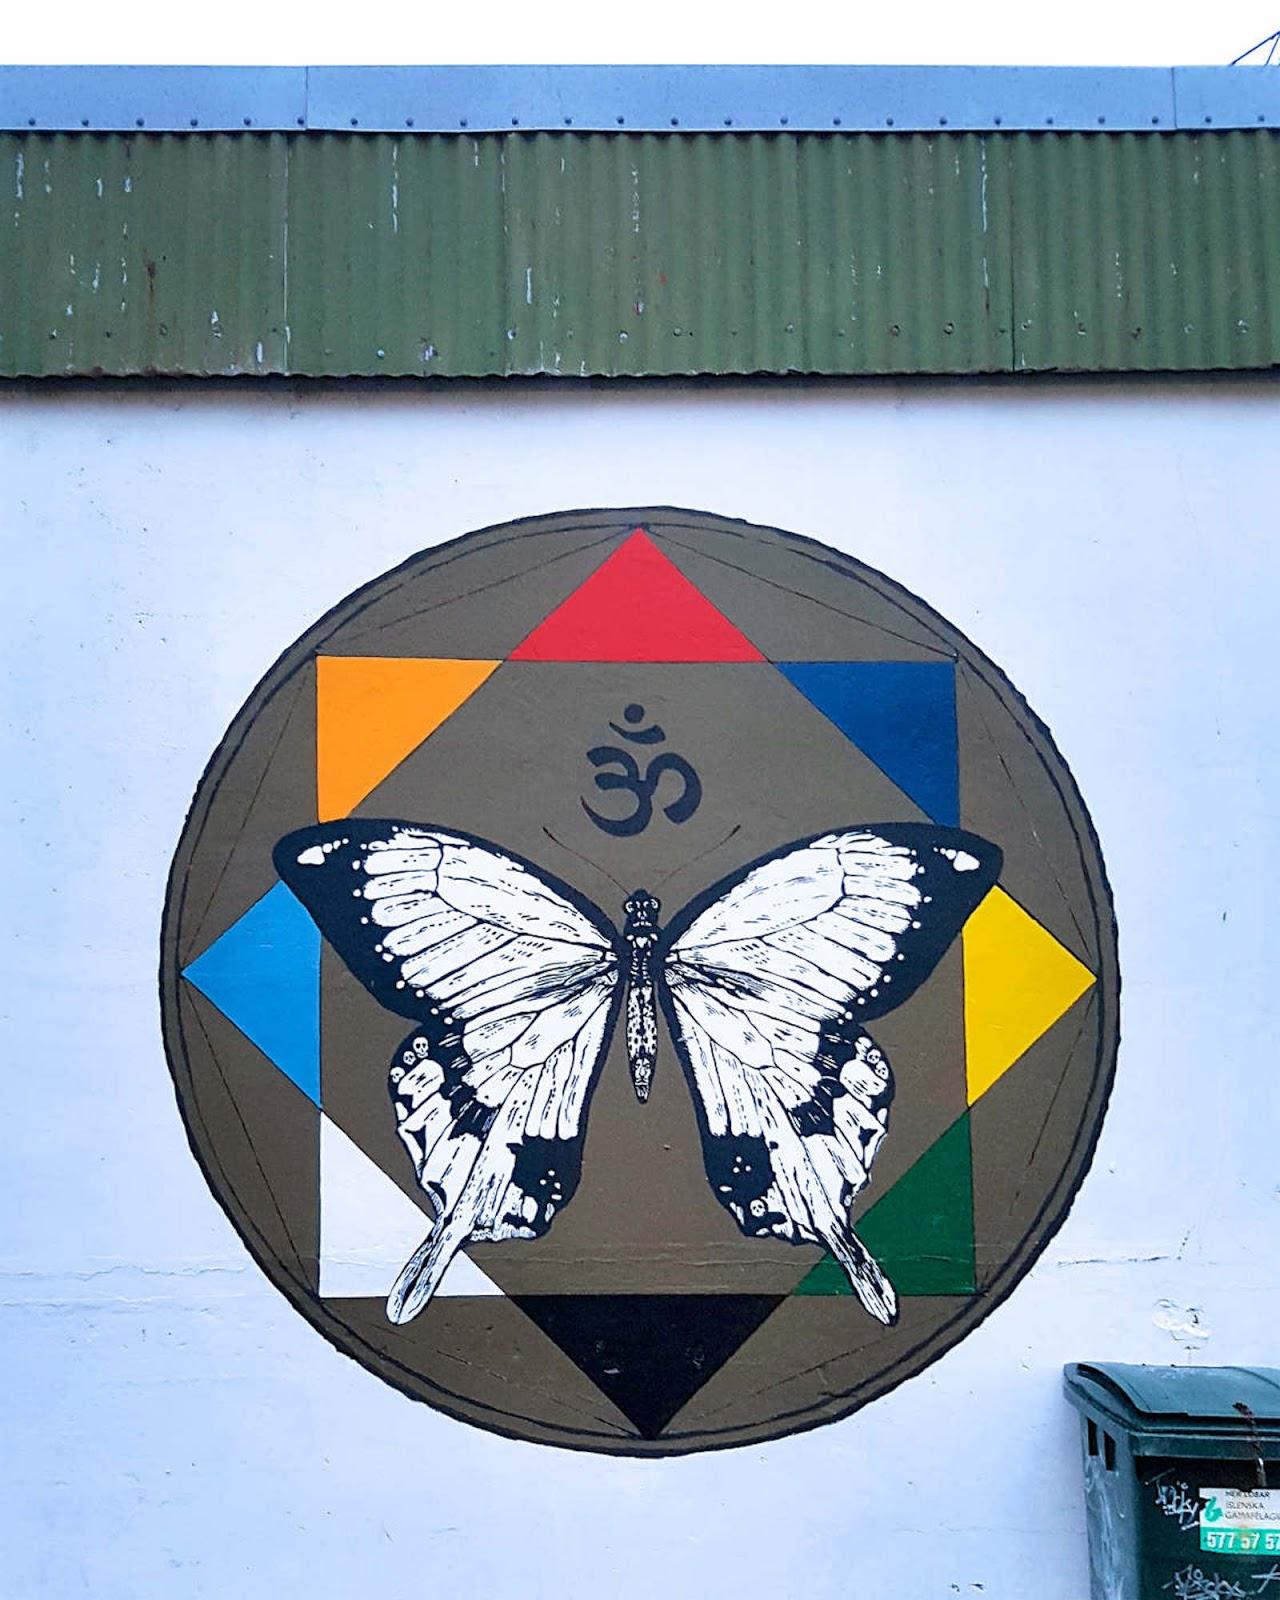 ufunk-reykjavik-street-art-10.jpg